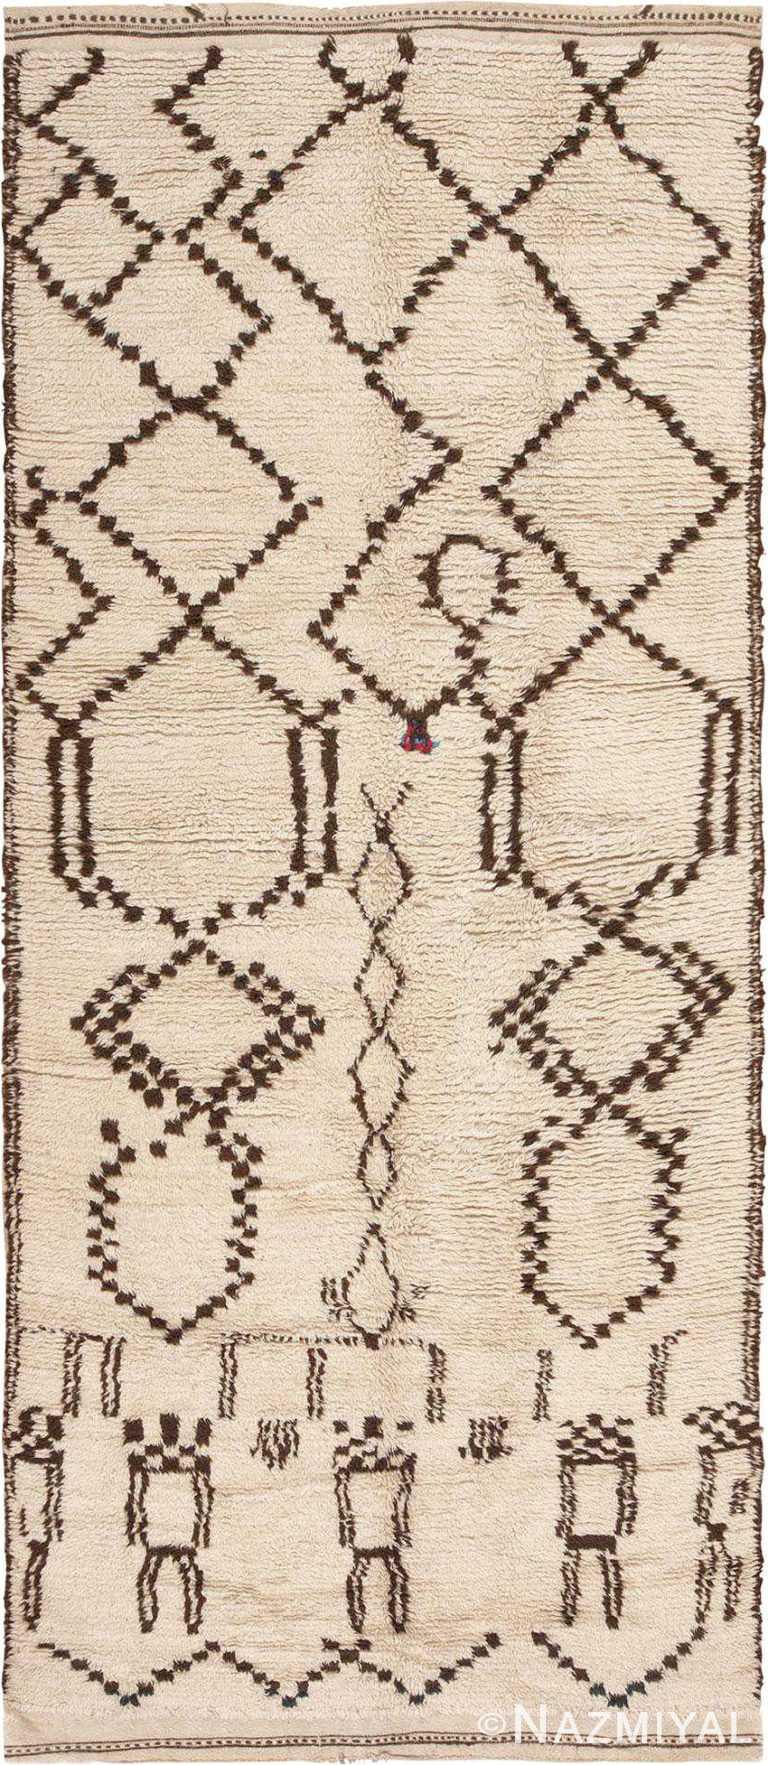 VintageMoroccan Berber Area Rug #46039 by Nazmiyal Antique Rugs